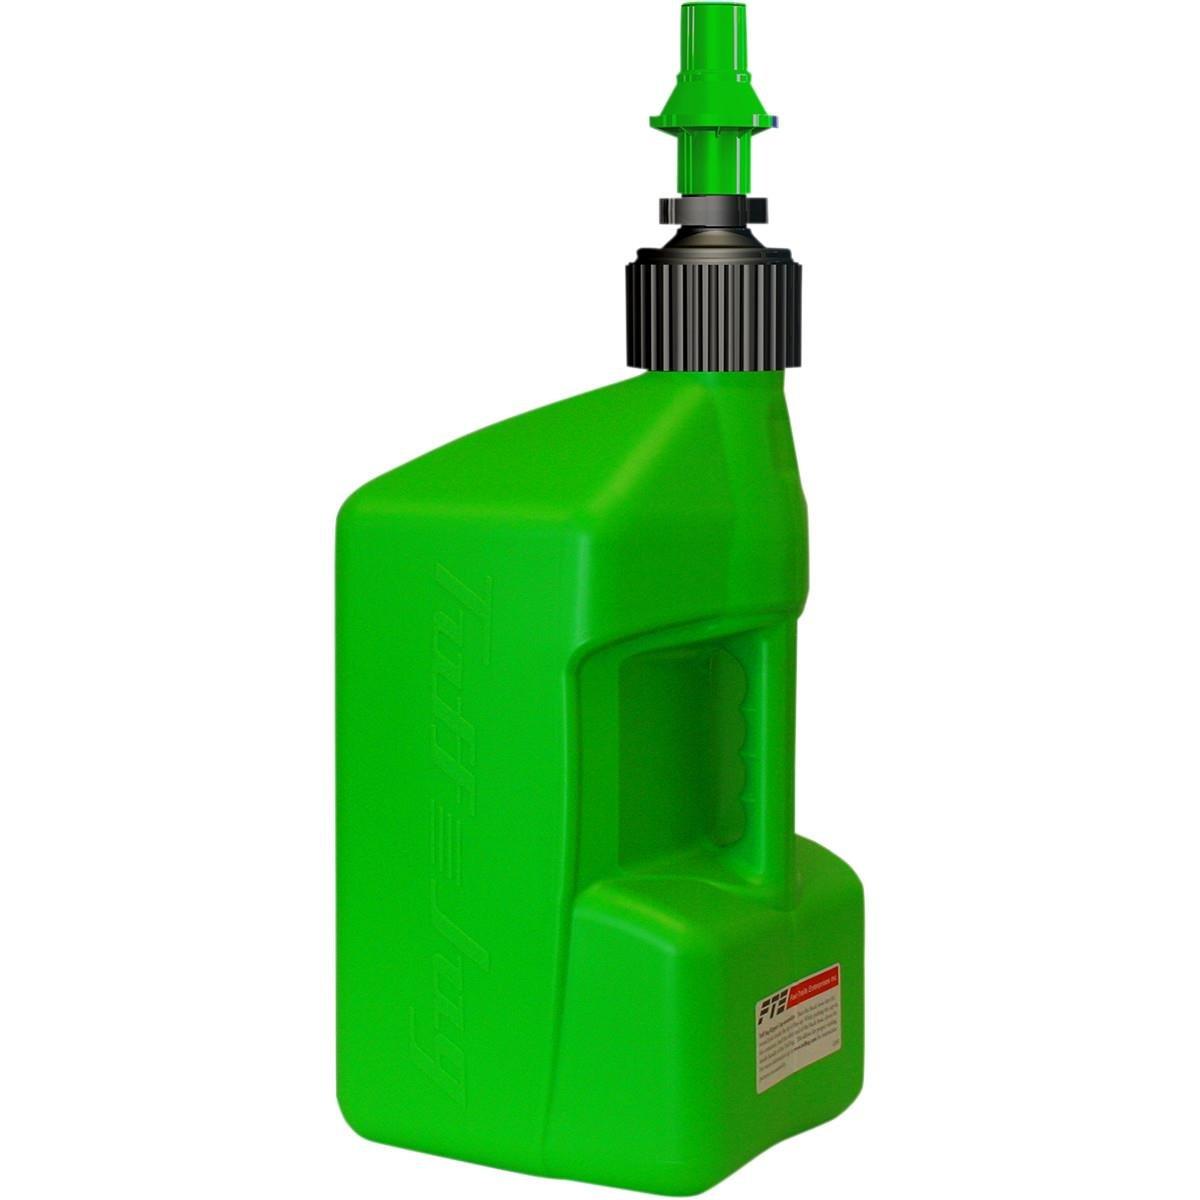 Tuff Jug 5gal Green KURG Tuff Jug with Standard Cap